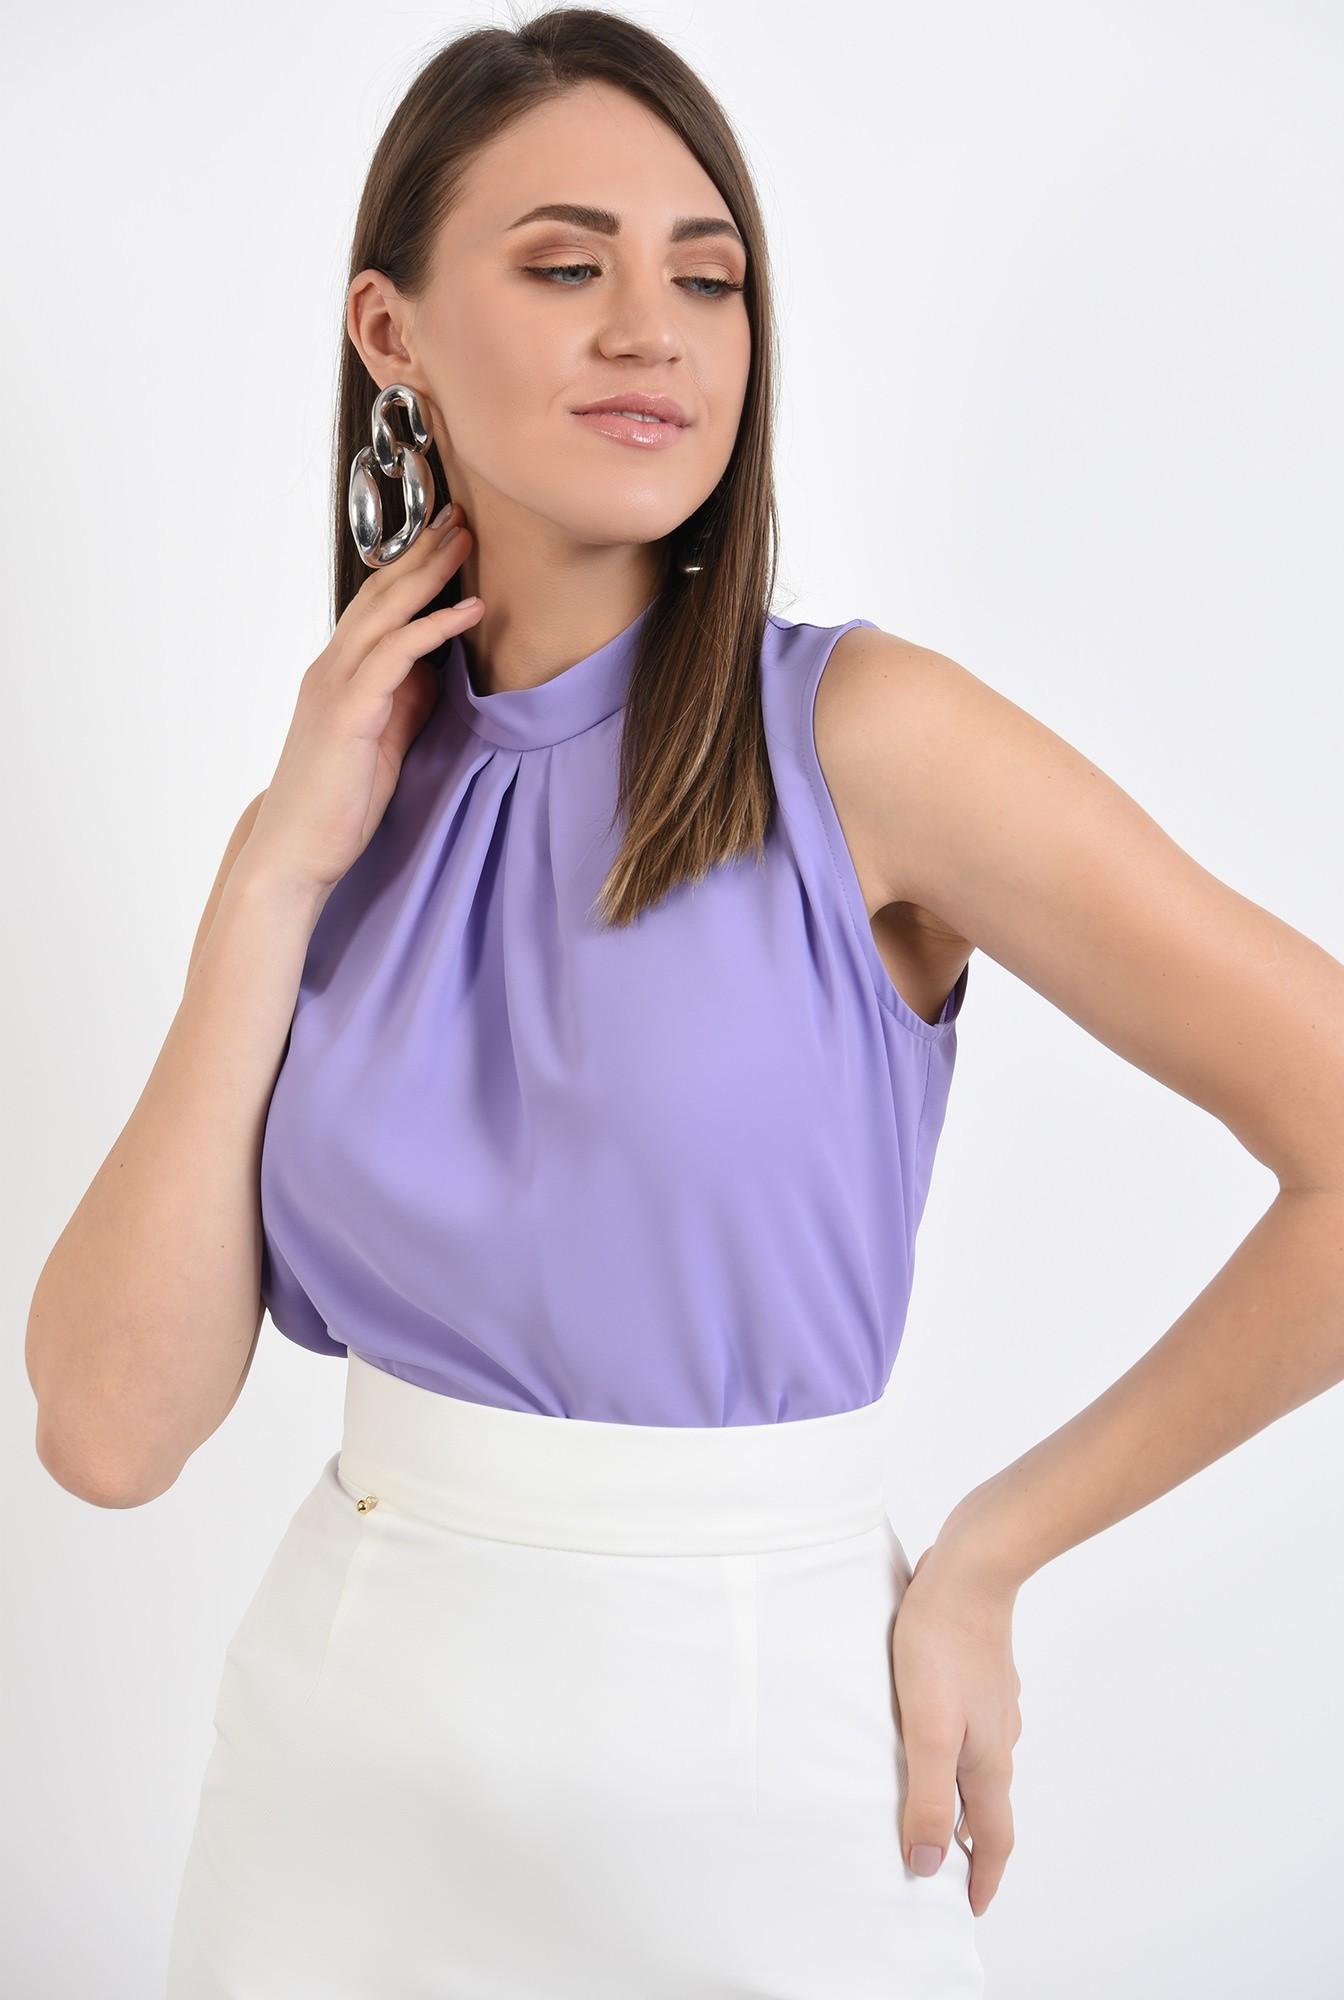 2 - bluza office, pliuri, guler mic, lila, bluza de primavara